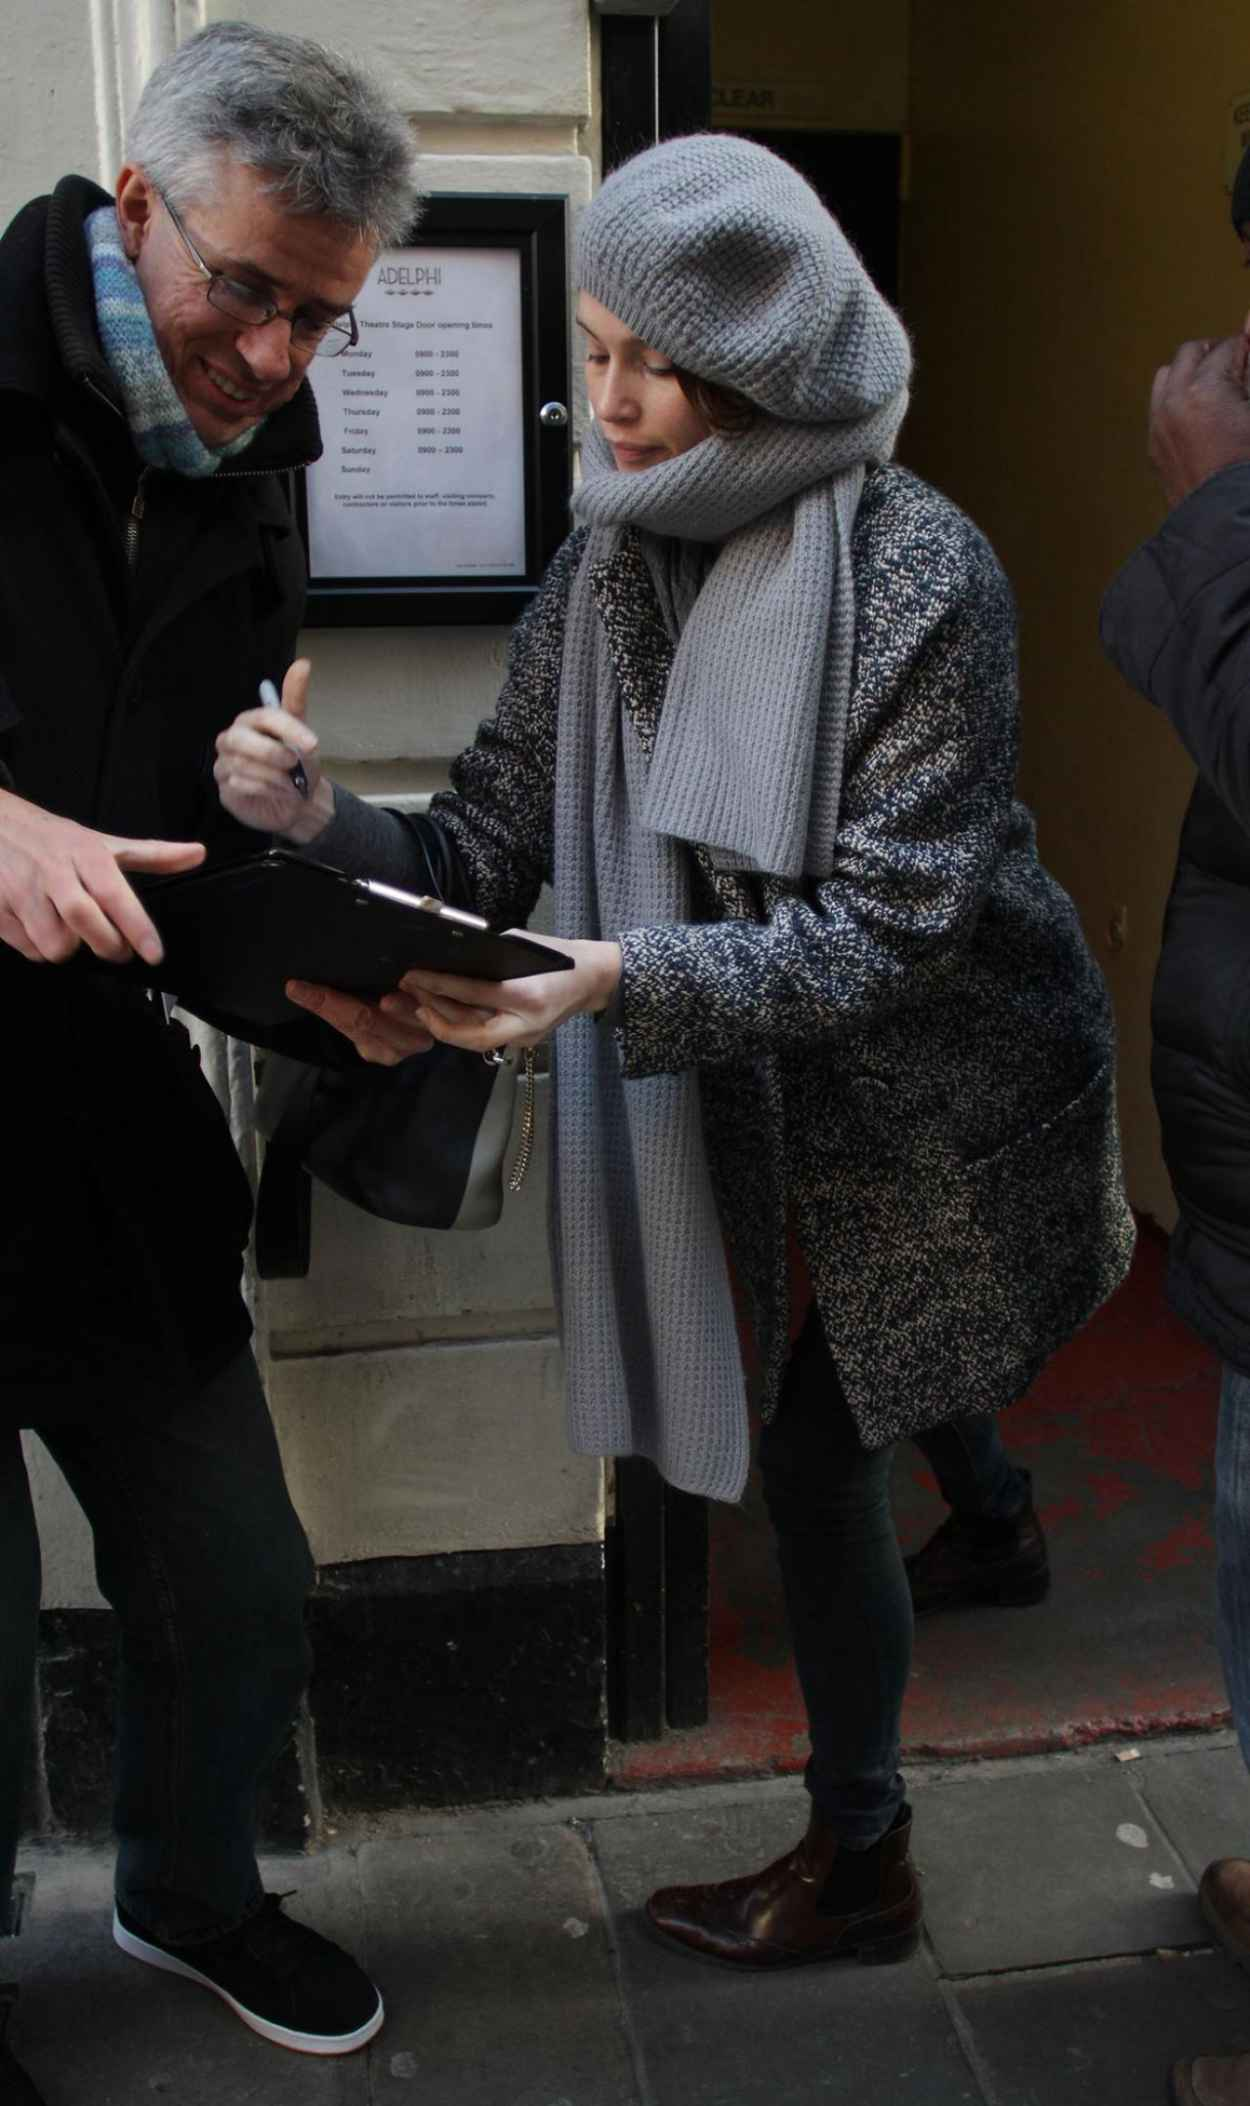 Gemma Arterton Signing Autographs - Adelphi Theatre in London, Dec. 2015-3